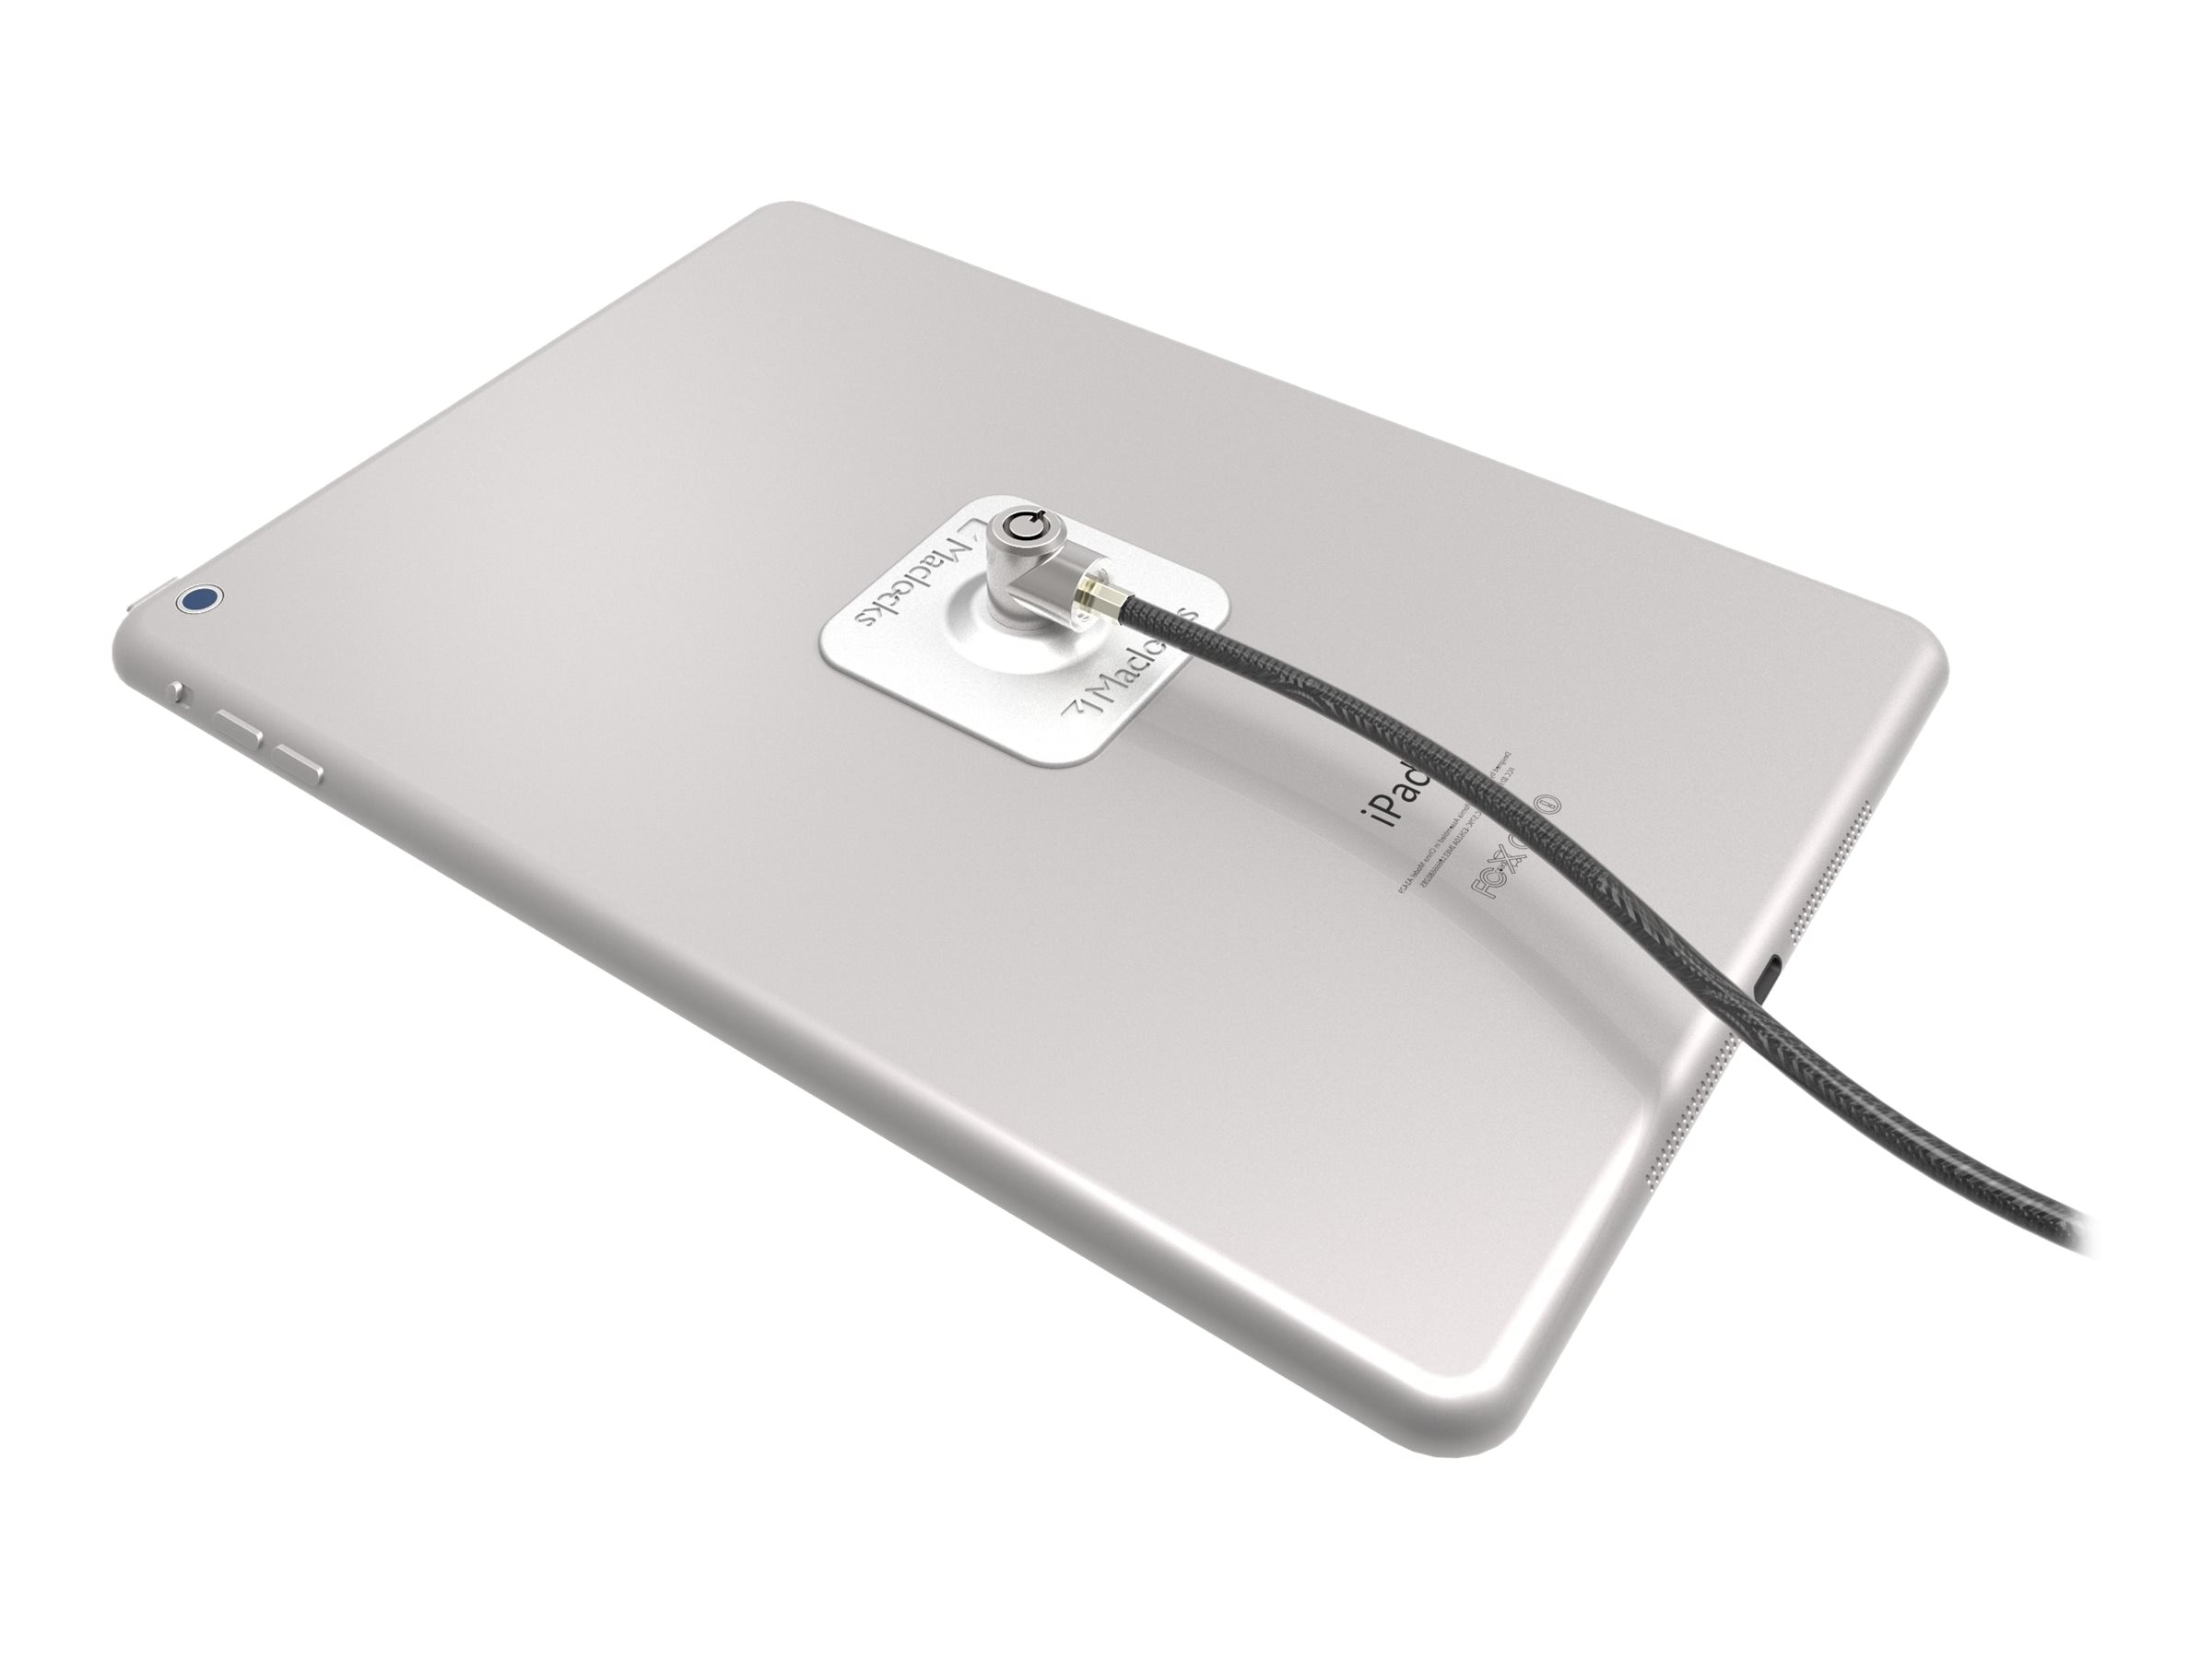 Compulocks Tablet Lock - Universal, CL15UTL, 14566515, Locks & Security Hardware